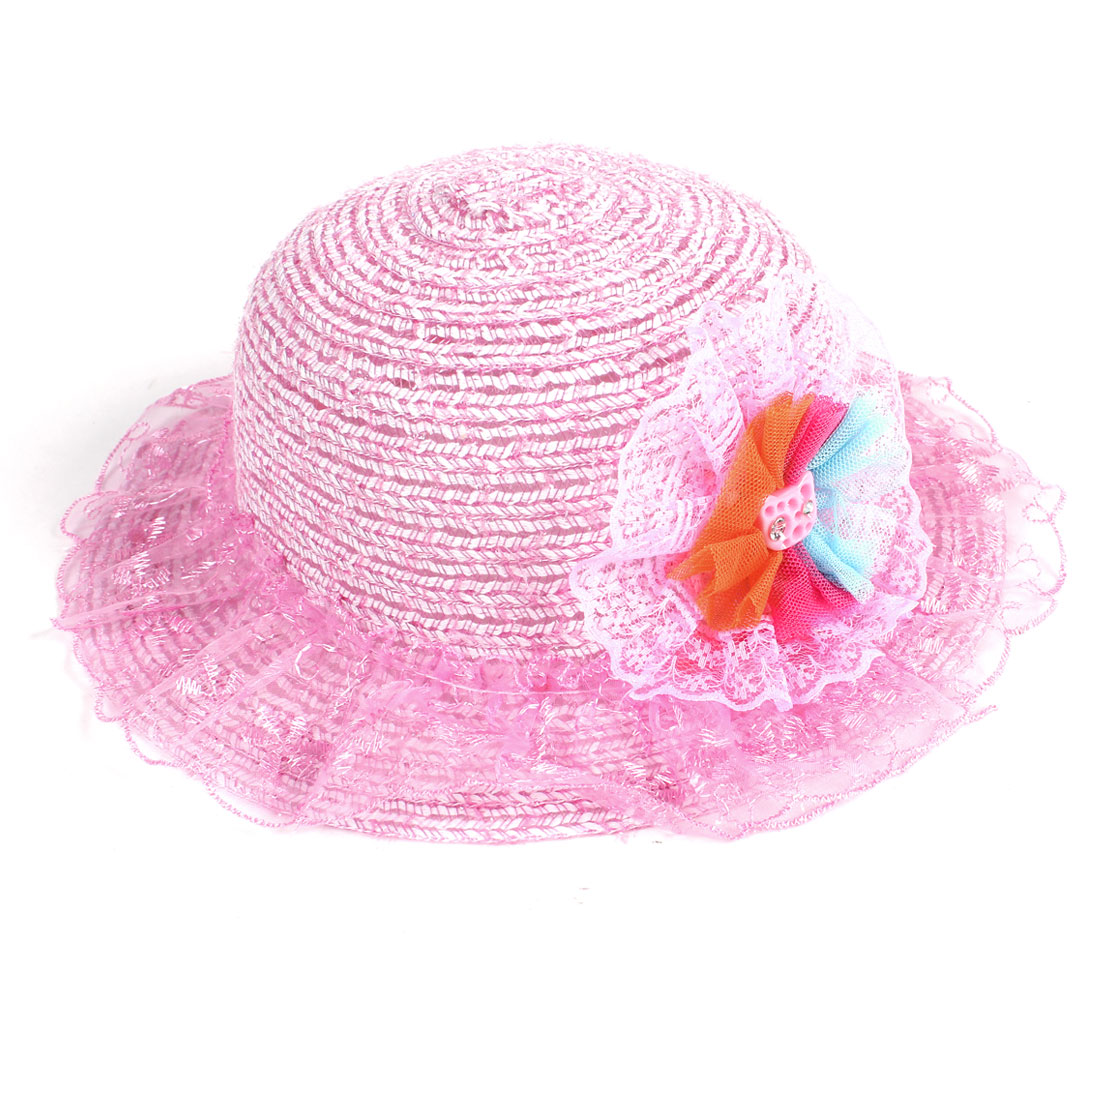 Pink Embroidered Floral Organza Decor Wide Brim Hat Cap for Children Girl